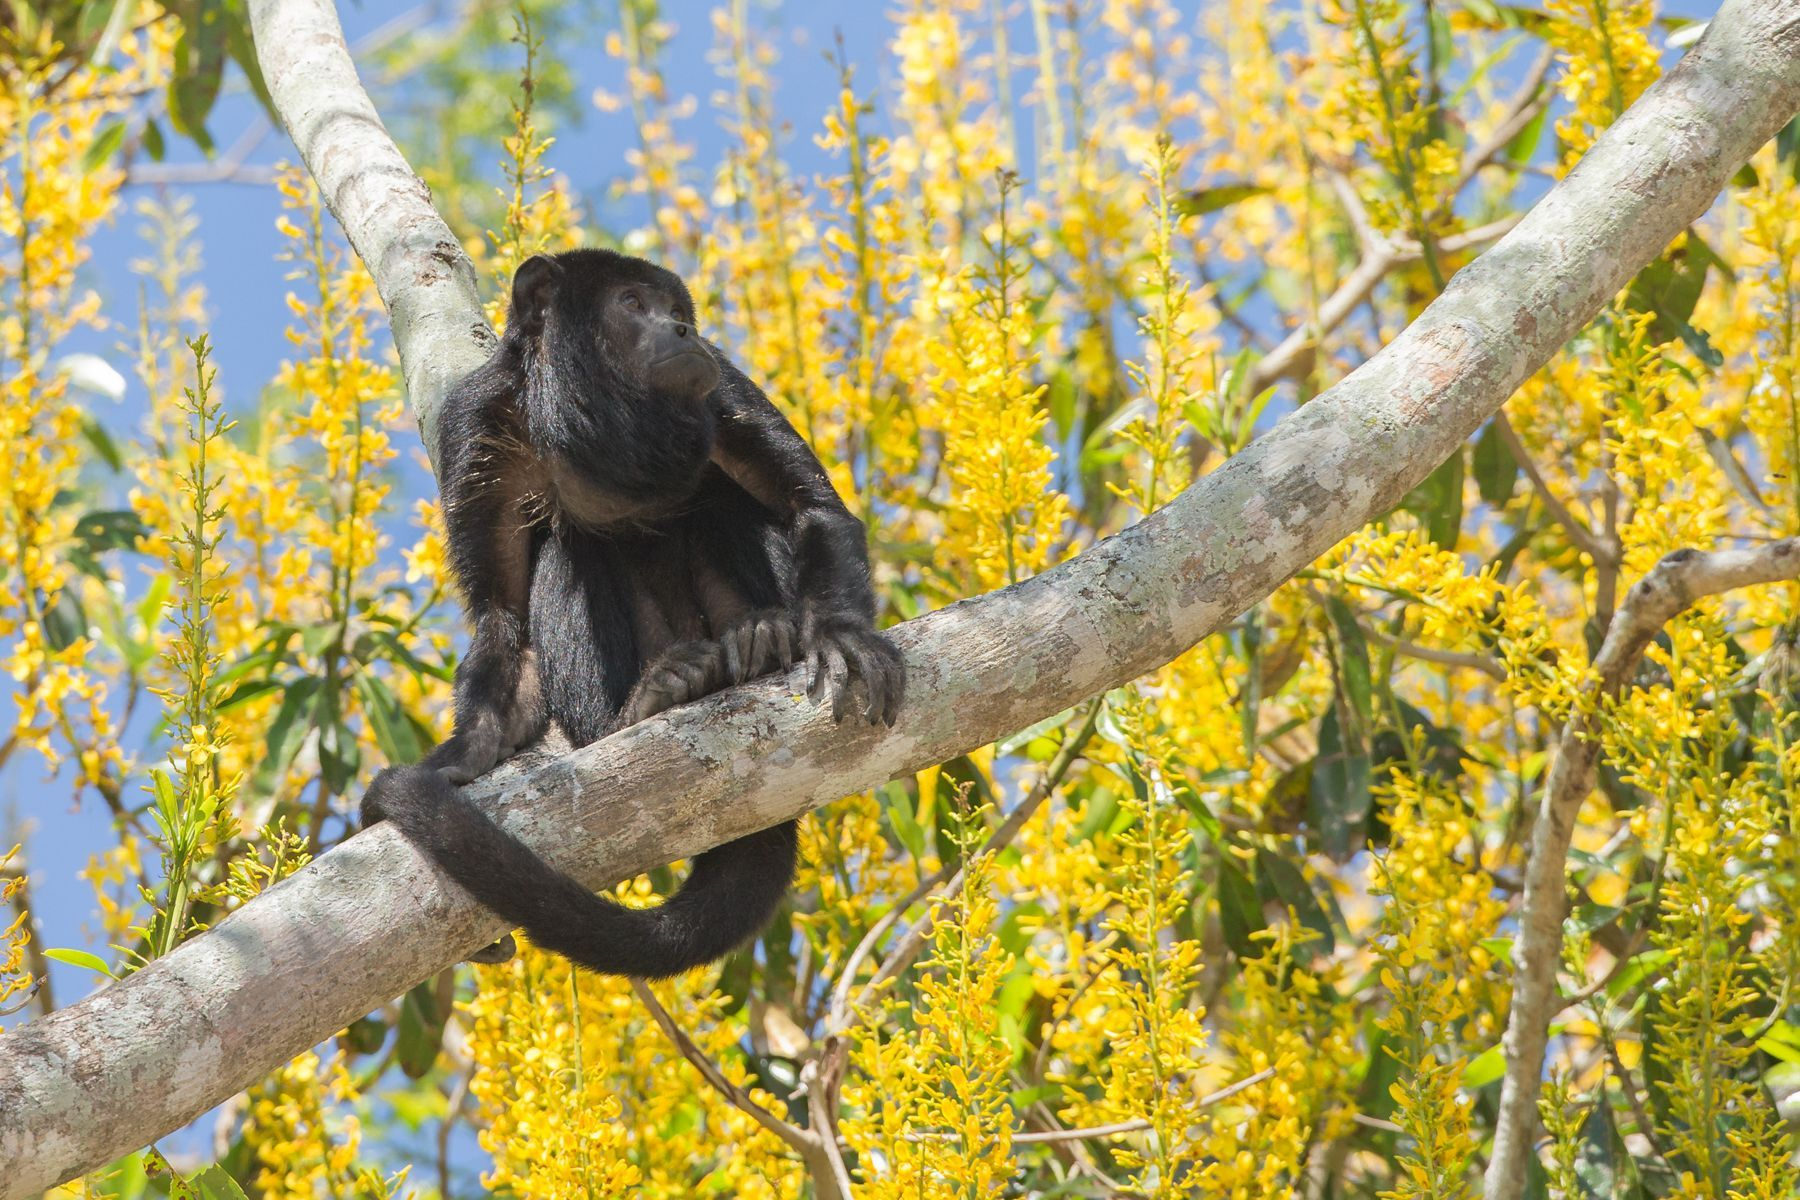 Black Howler Monkeys make quite a racket at dawn and dusk